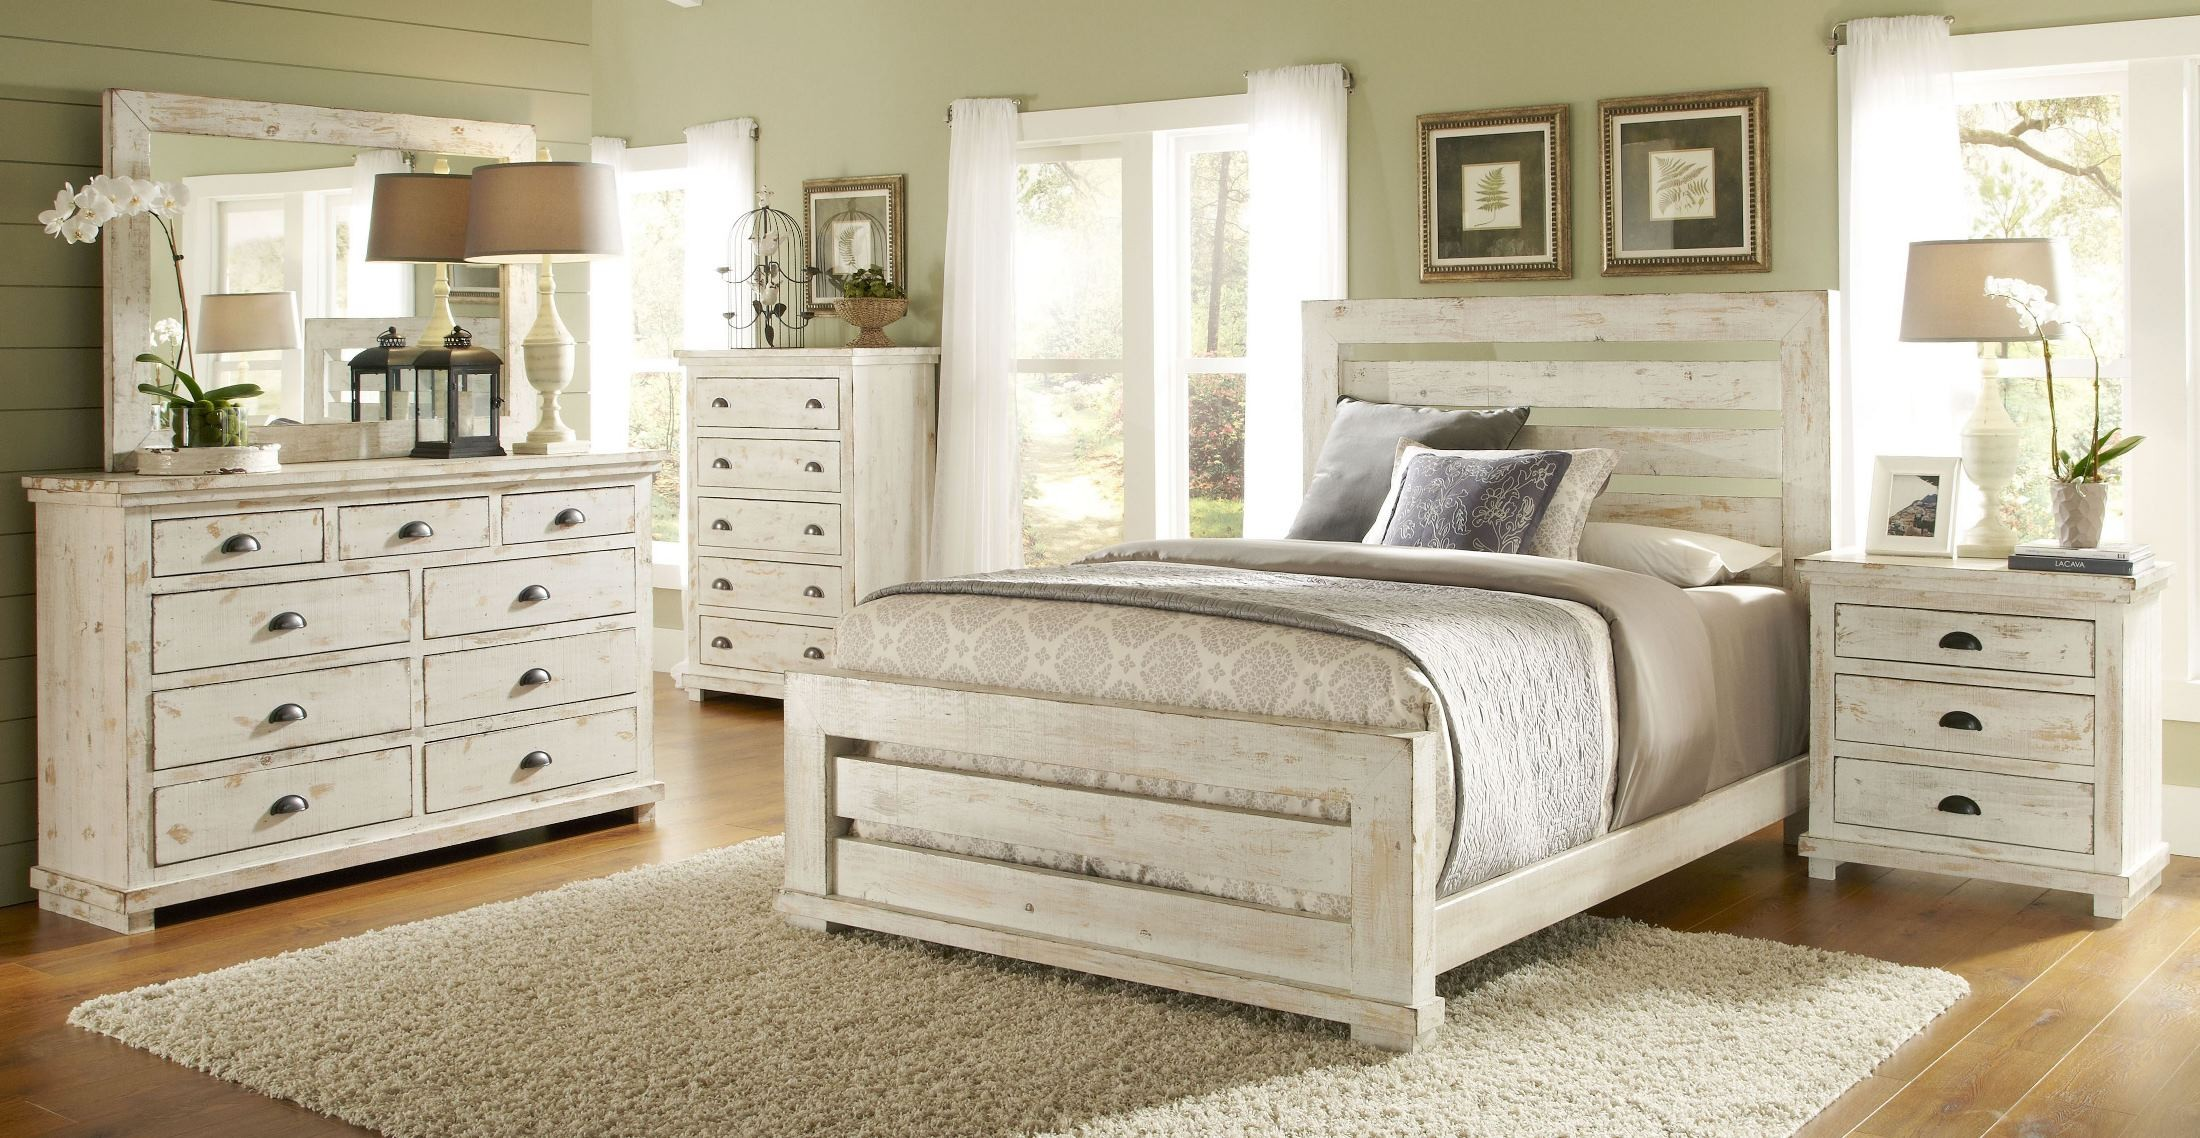 willow distressed white slat bedroom set p610606178